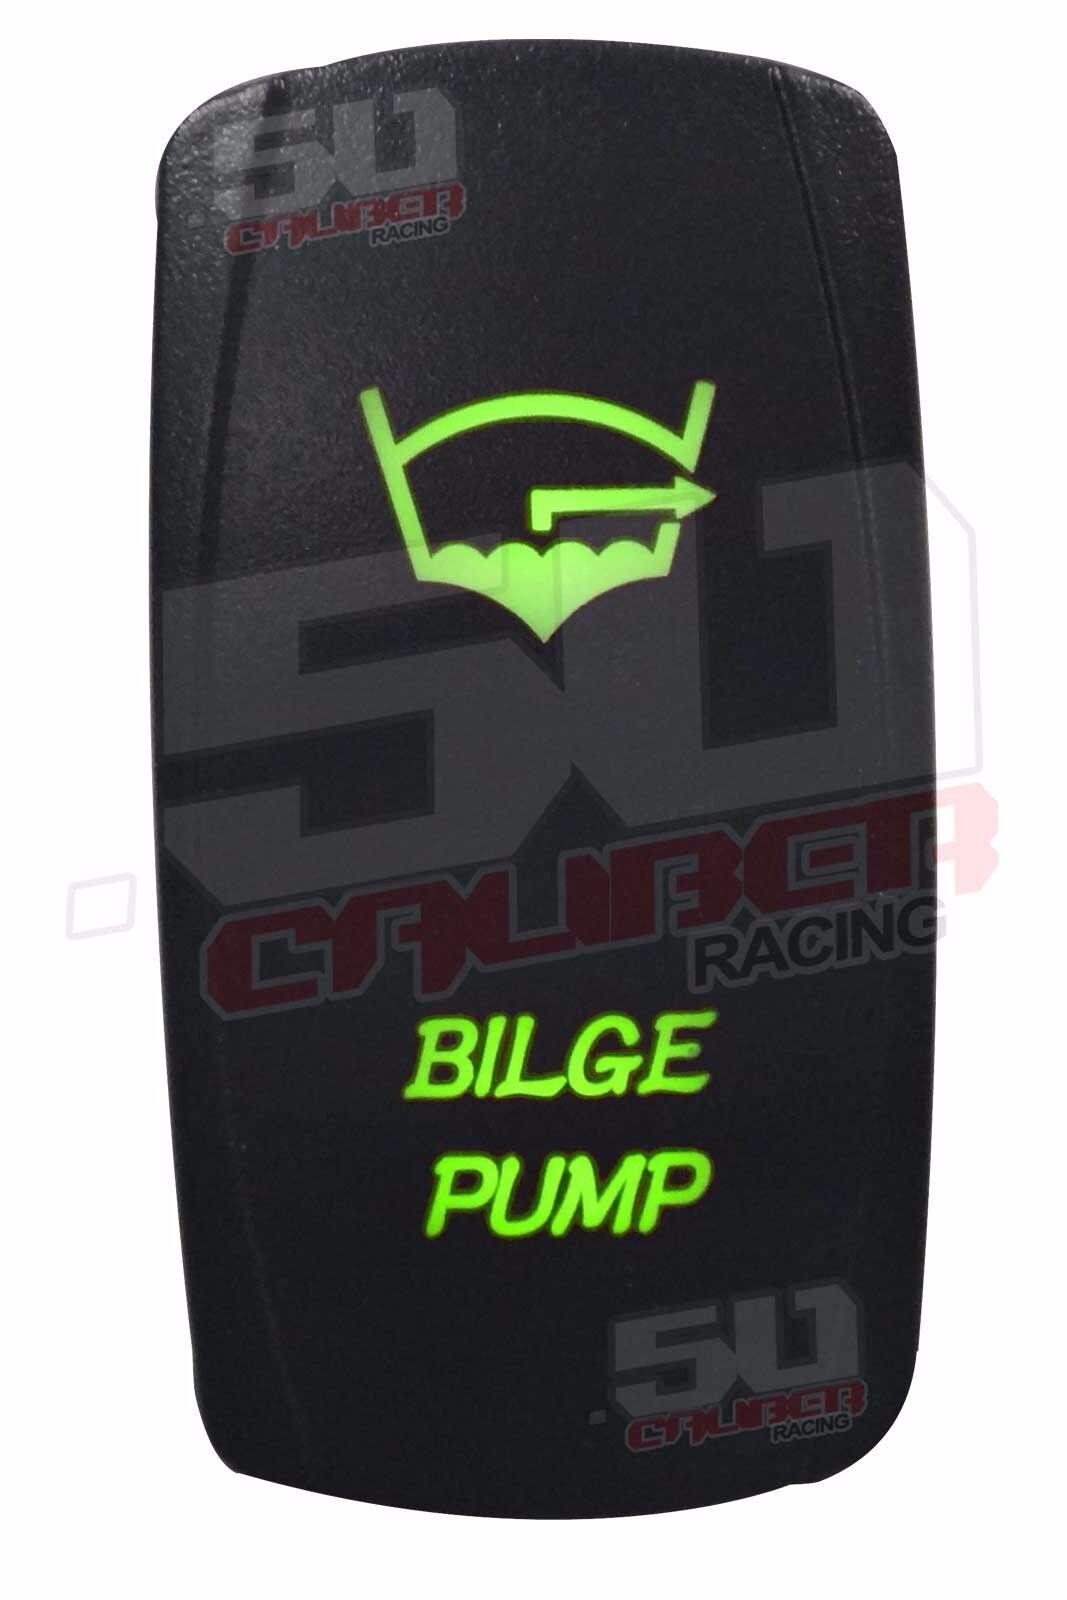 Marine Boat Bilge Pump Rocker Switch Green for Mastercraft Chaparral Elan Malibu